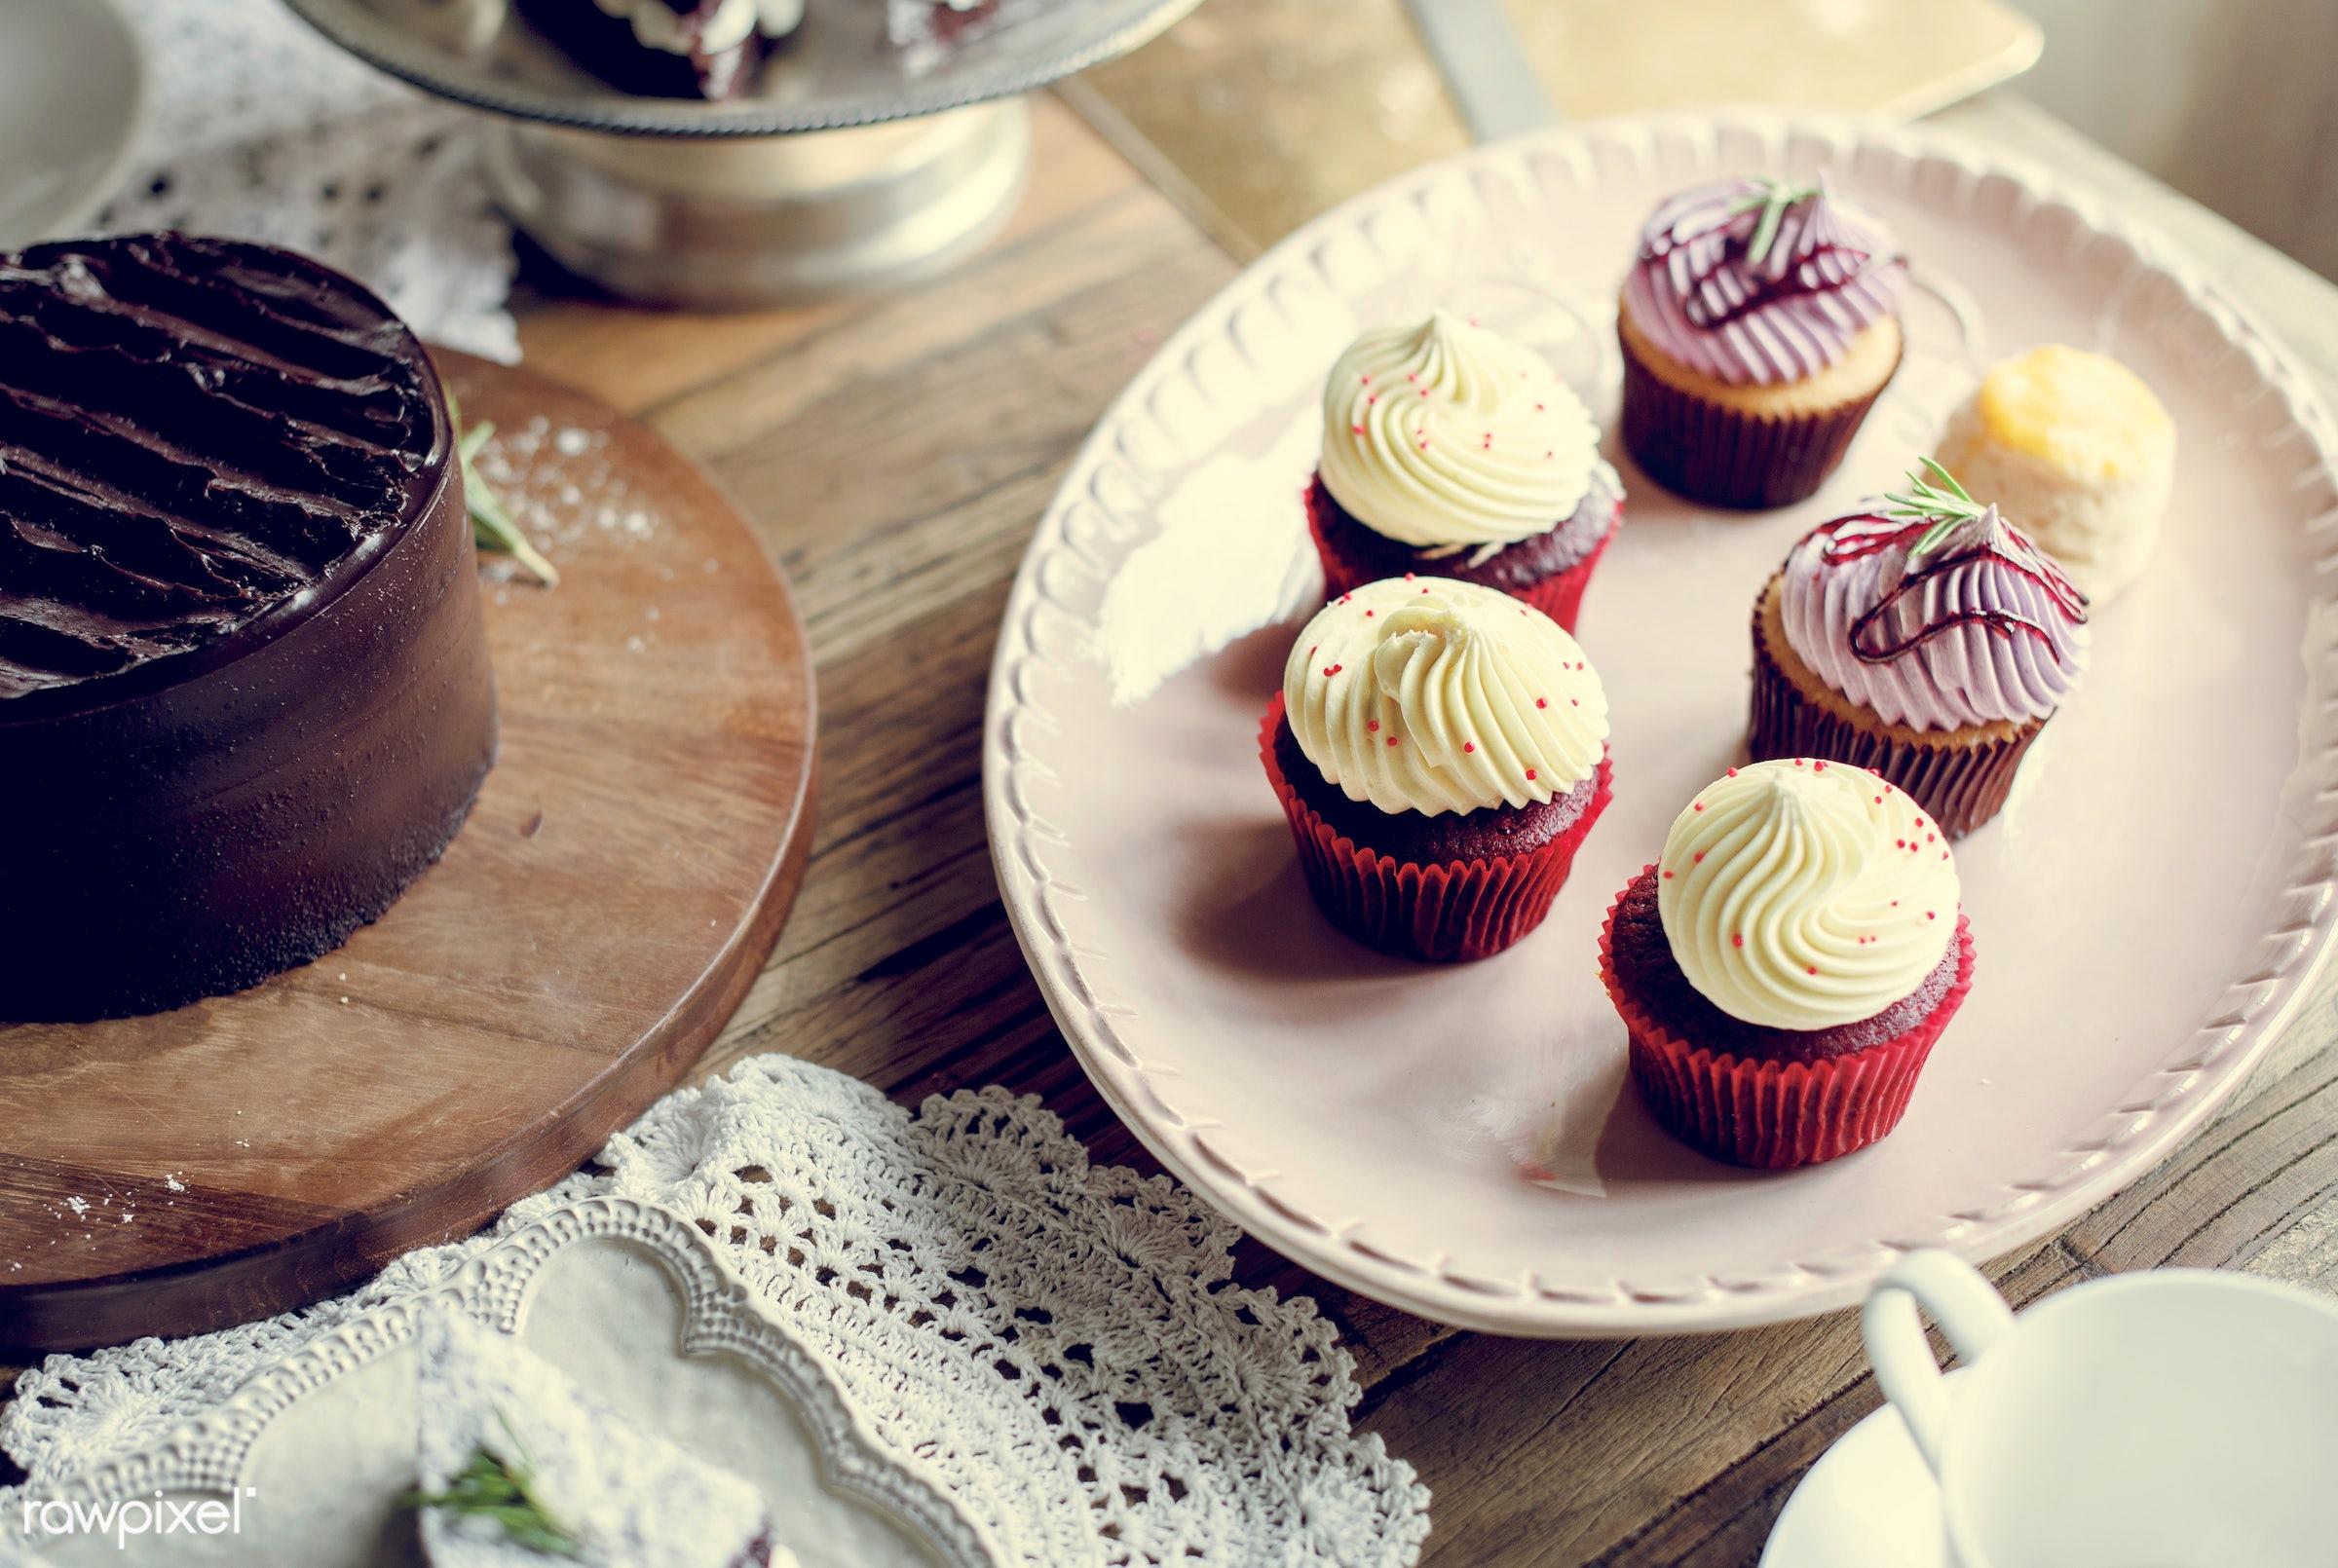 dish, birthday, nobody, recipe, catering, bake, party, tea, baked, tea party, break, bakery, tea break, frosting, event,...